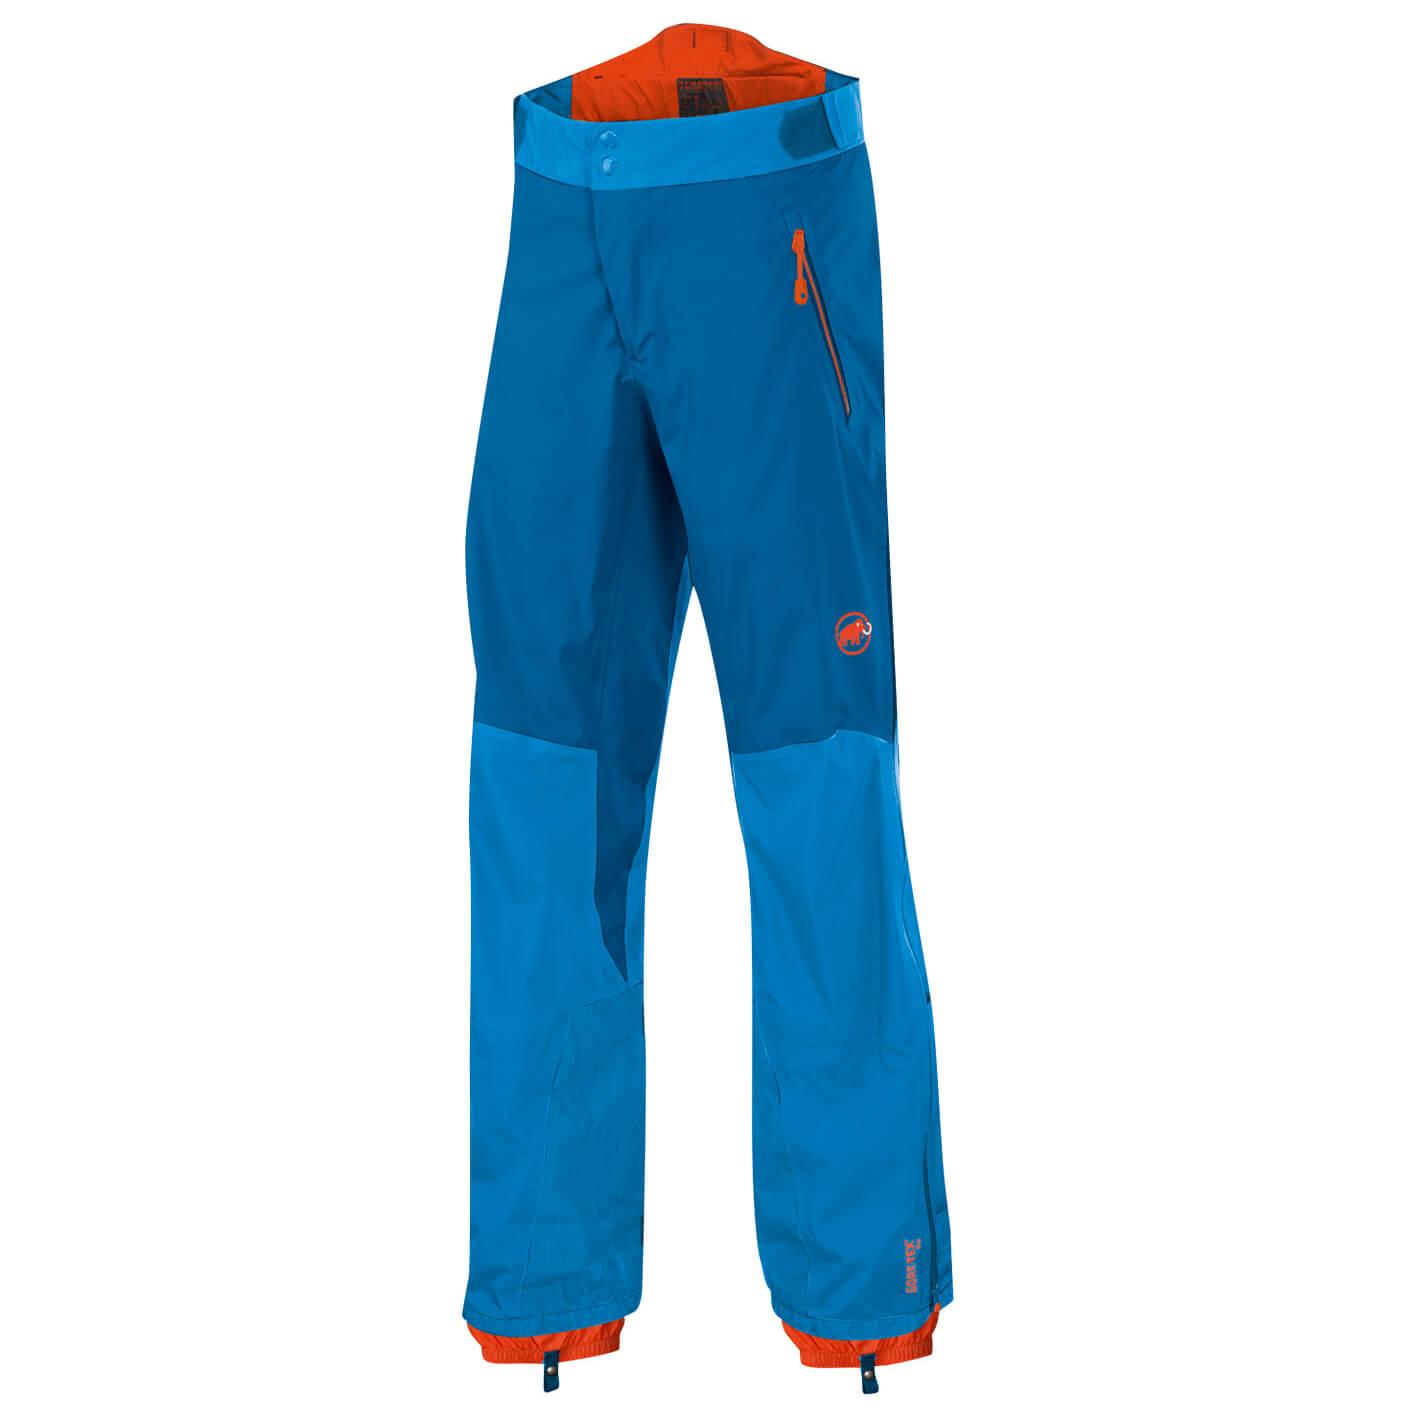 f2f0e916 Mammut Nordwand Pro HS Pants - Regnbukser Herre køb online ...